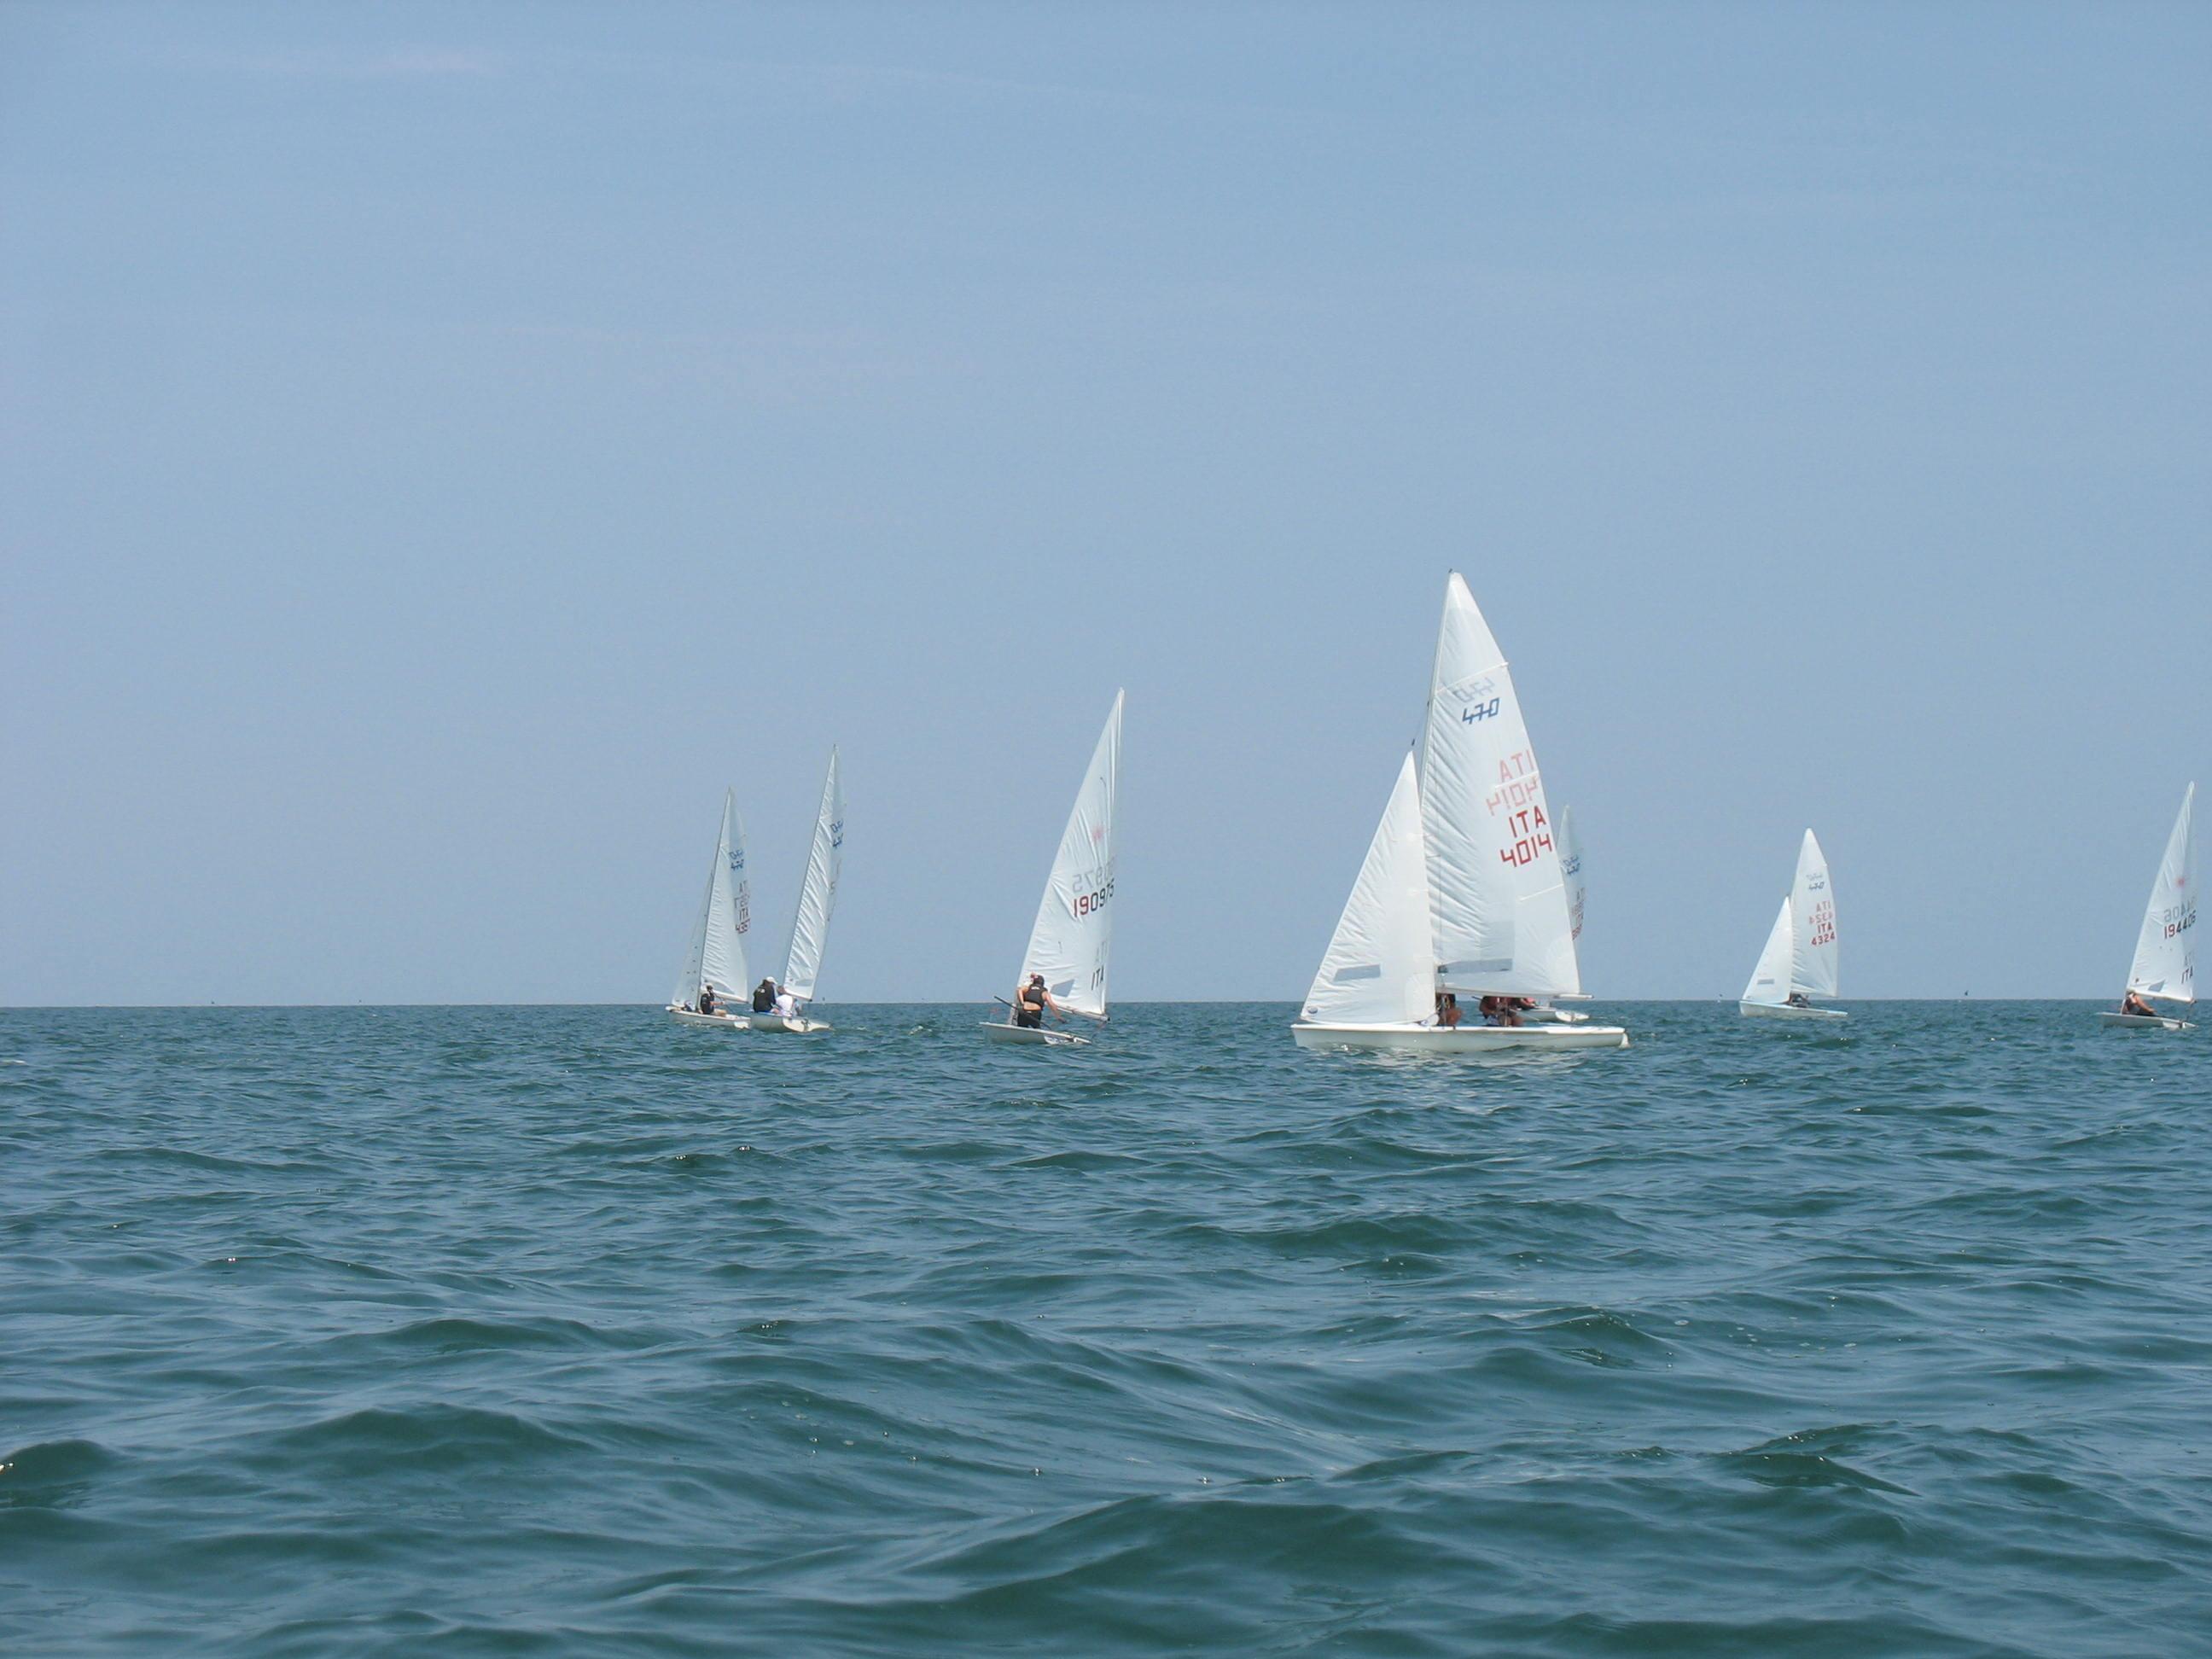 5-torneo-elia-tonelli-27062010-083